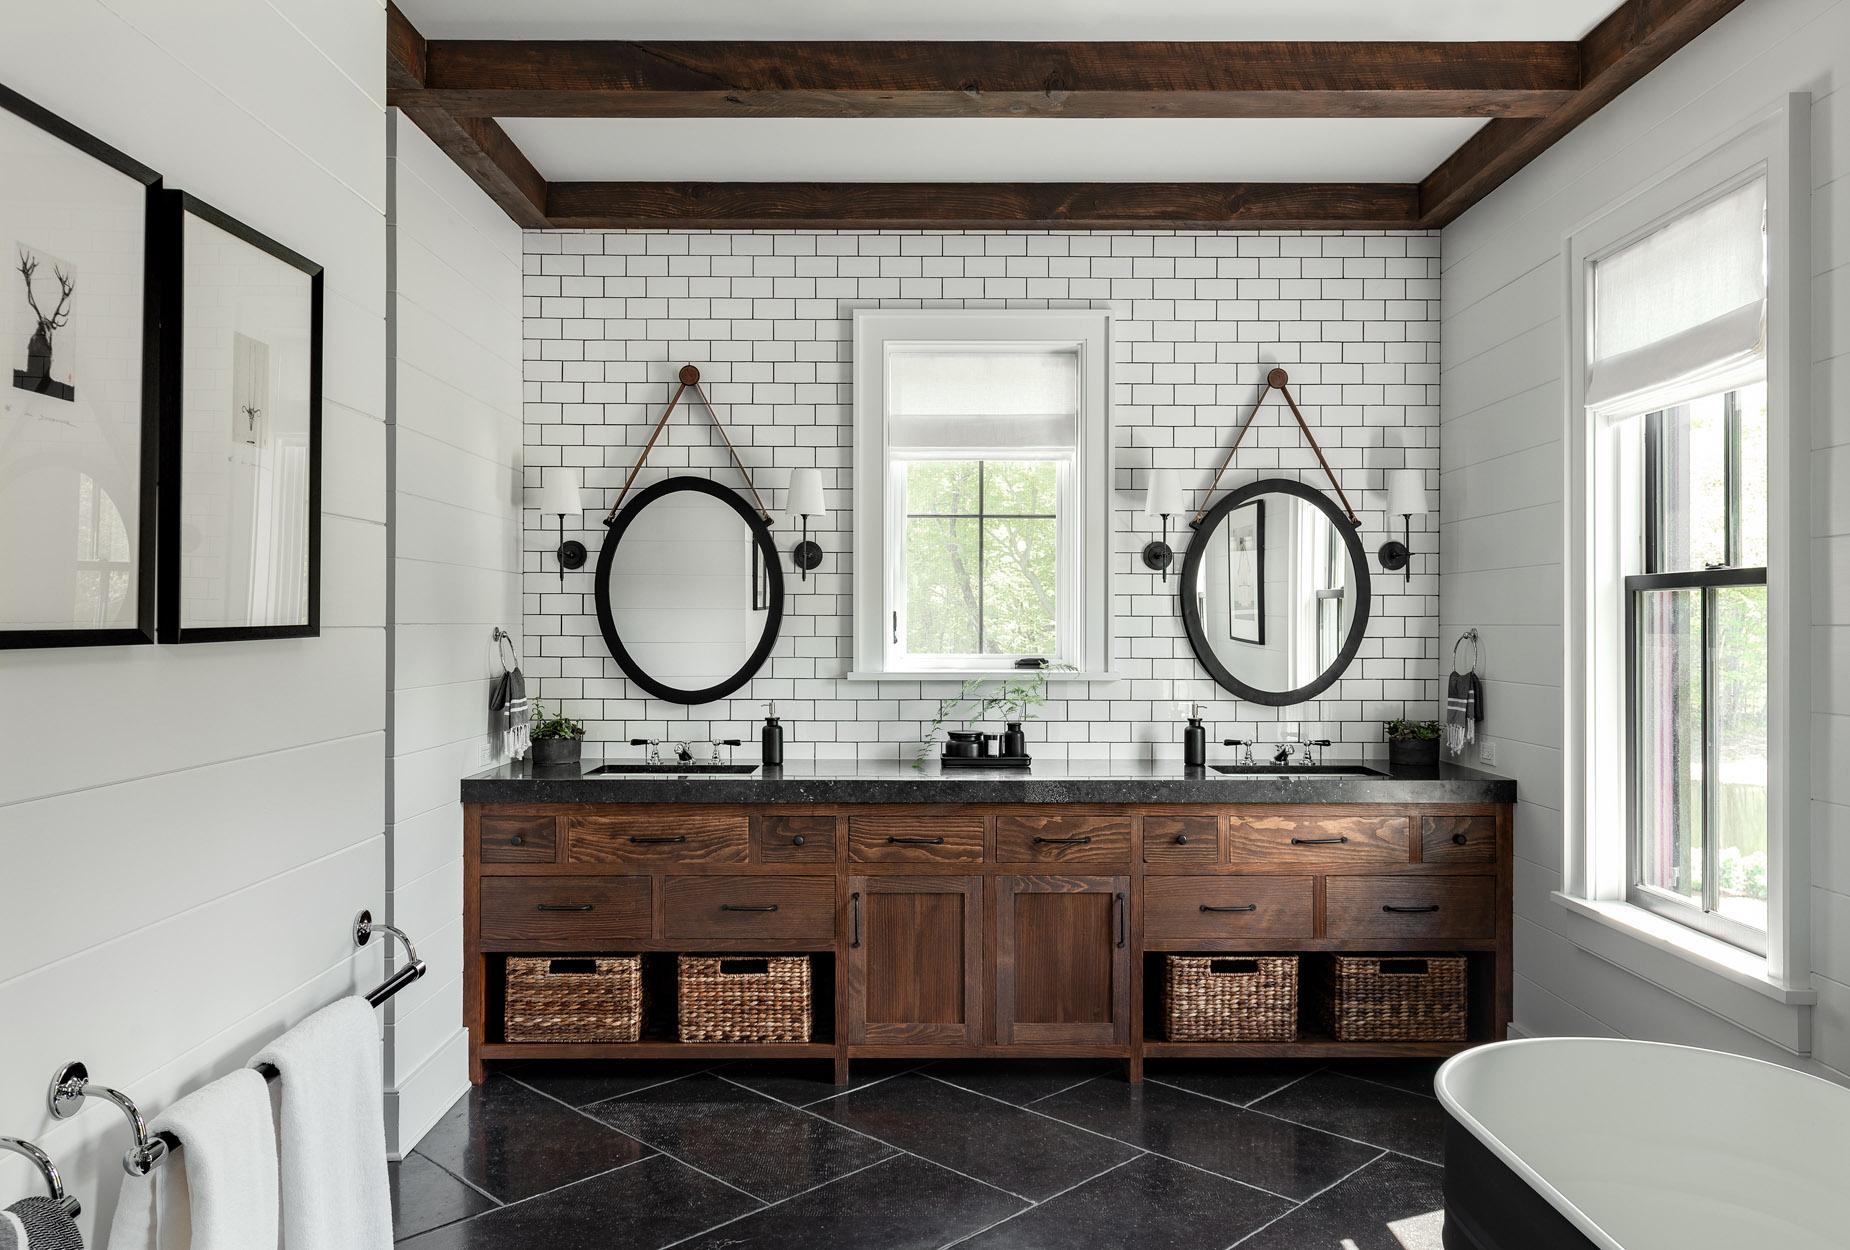 15 Very Different Bathrooms - On the Drawing Board on Bathroom Ideas Modern Farmhouse  id=36967